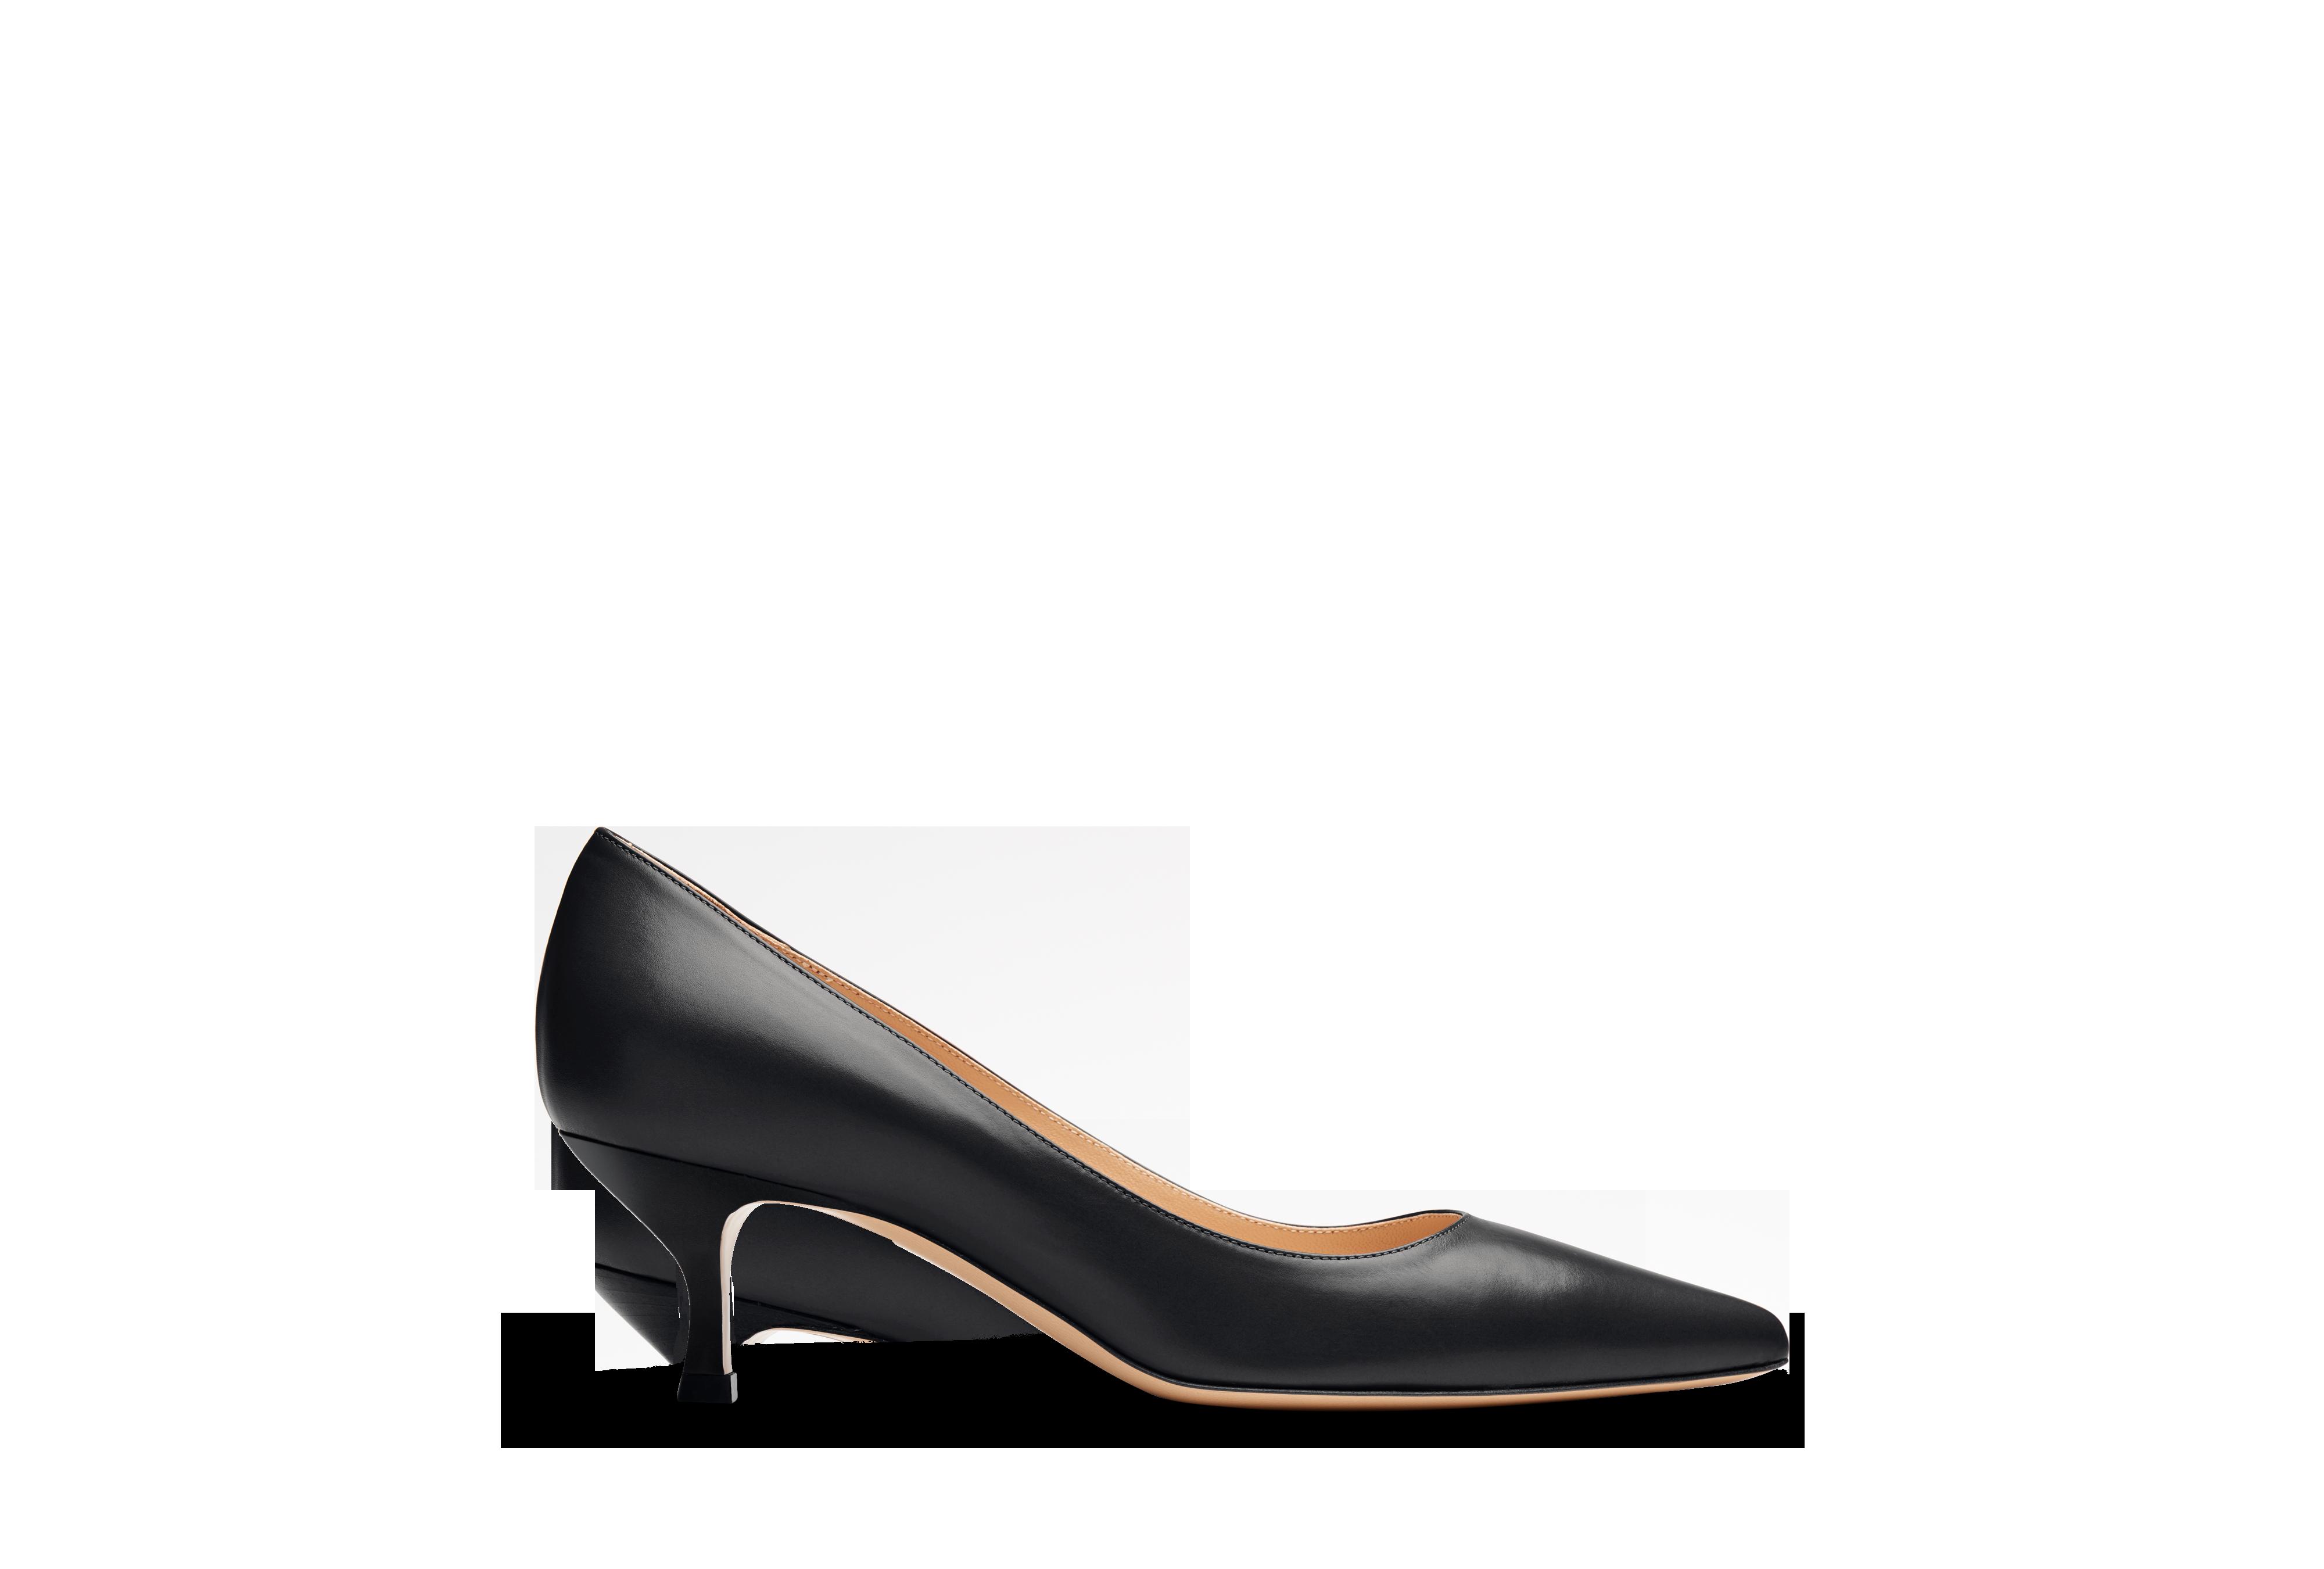 ed5c68b6912 The Gattino   Want   Heels, Leather high heels, Kitten heel pumps